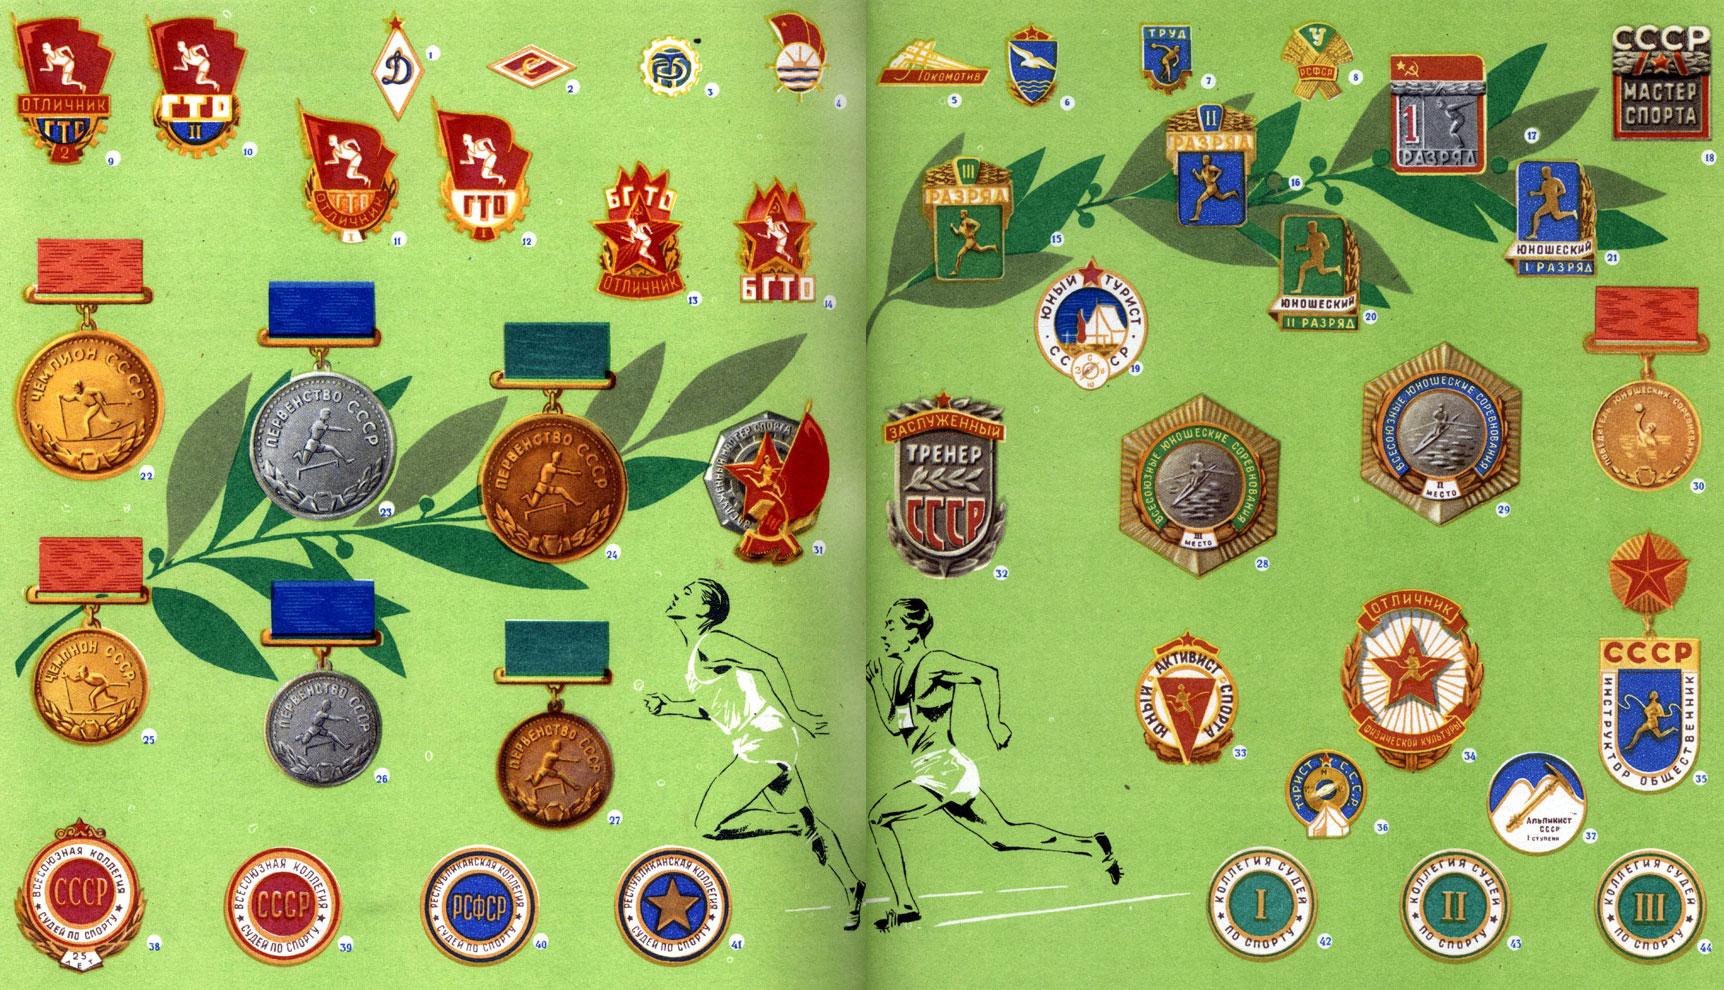 ... Значок туриста СССР; 37. Значок: sport-history.ru/physicalculture/item/f00/s00/e0000909/index.shtml